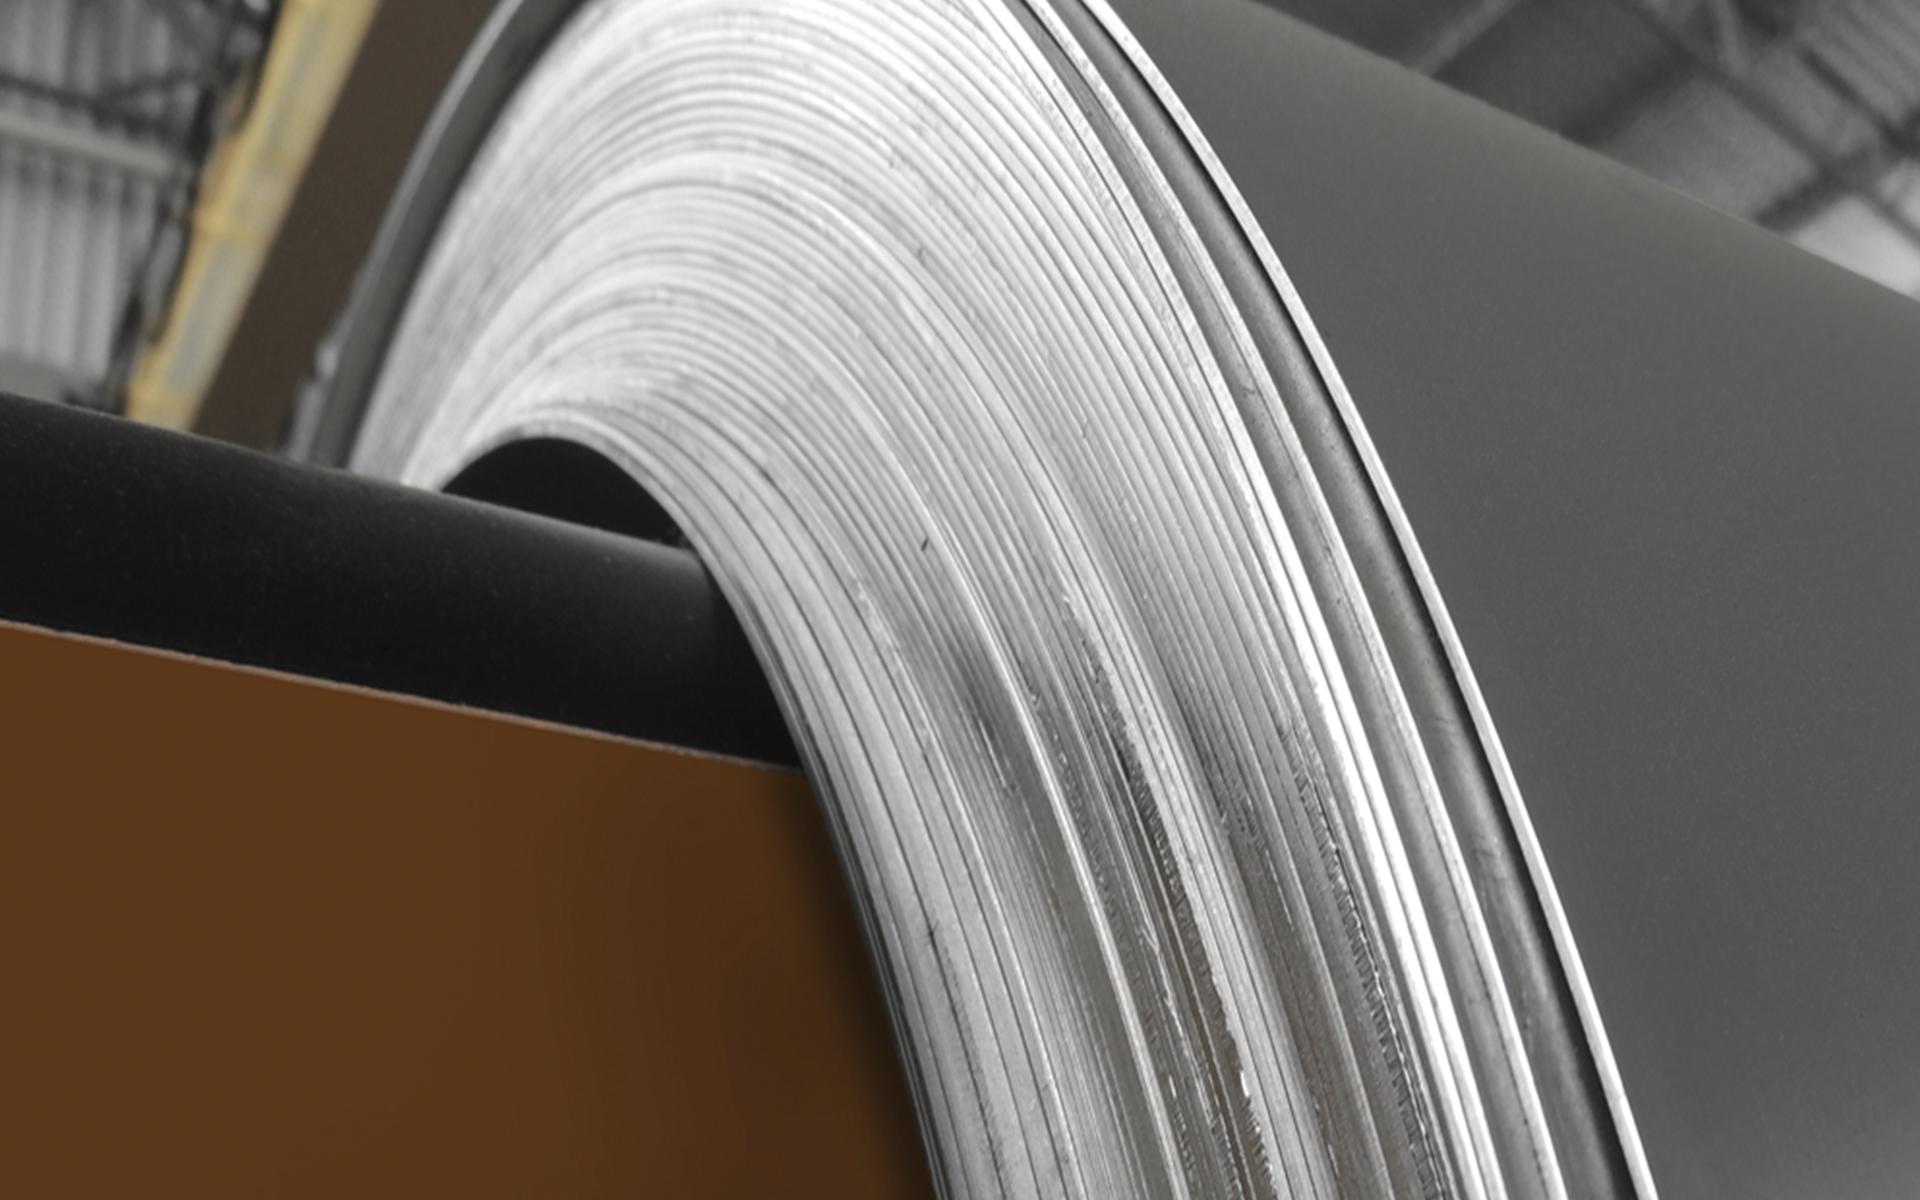 fabrica de productos de aluminio para reposteria